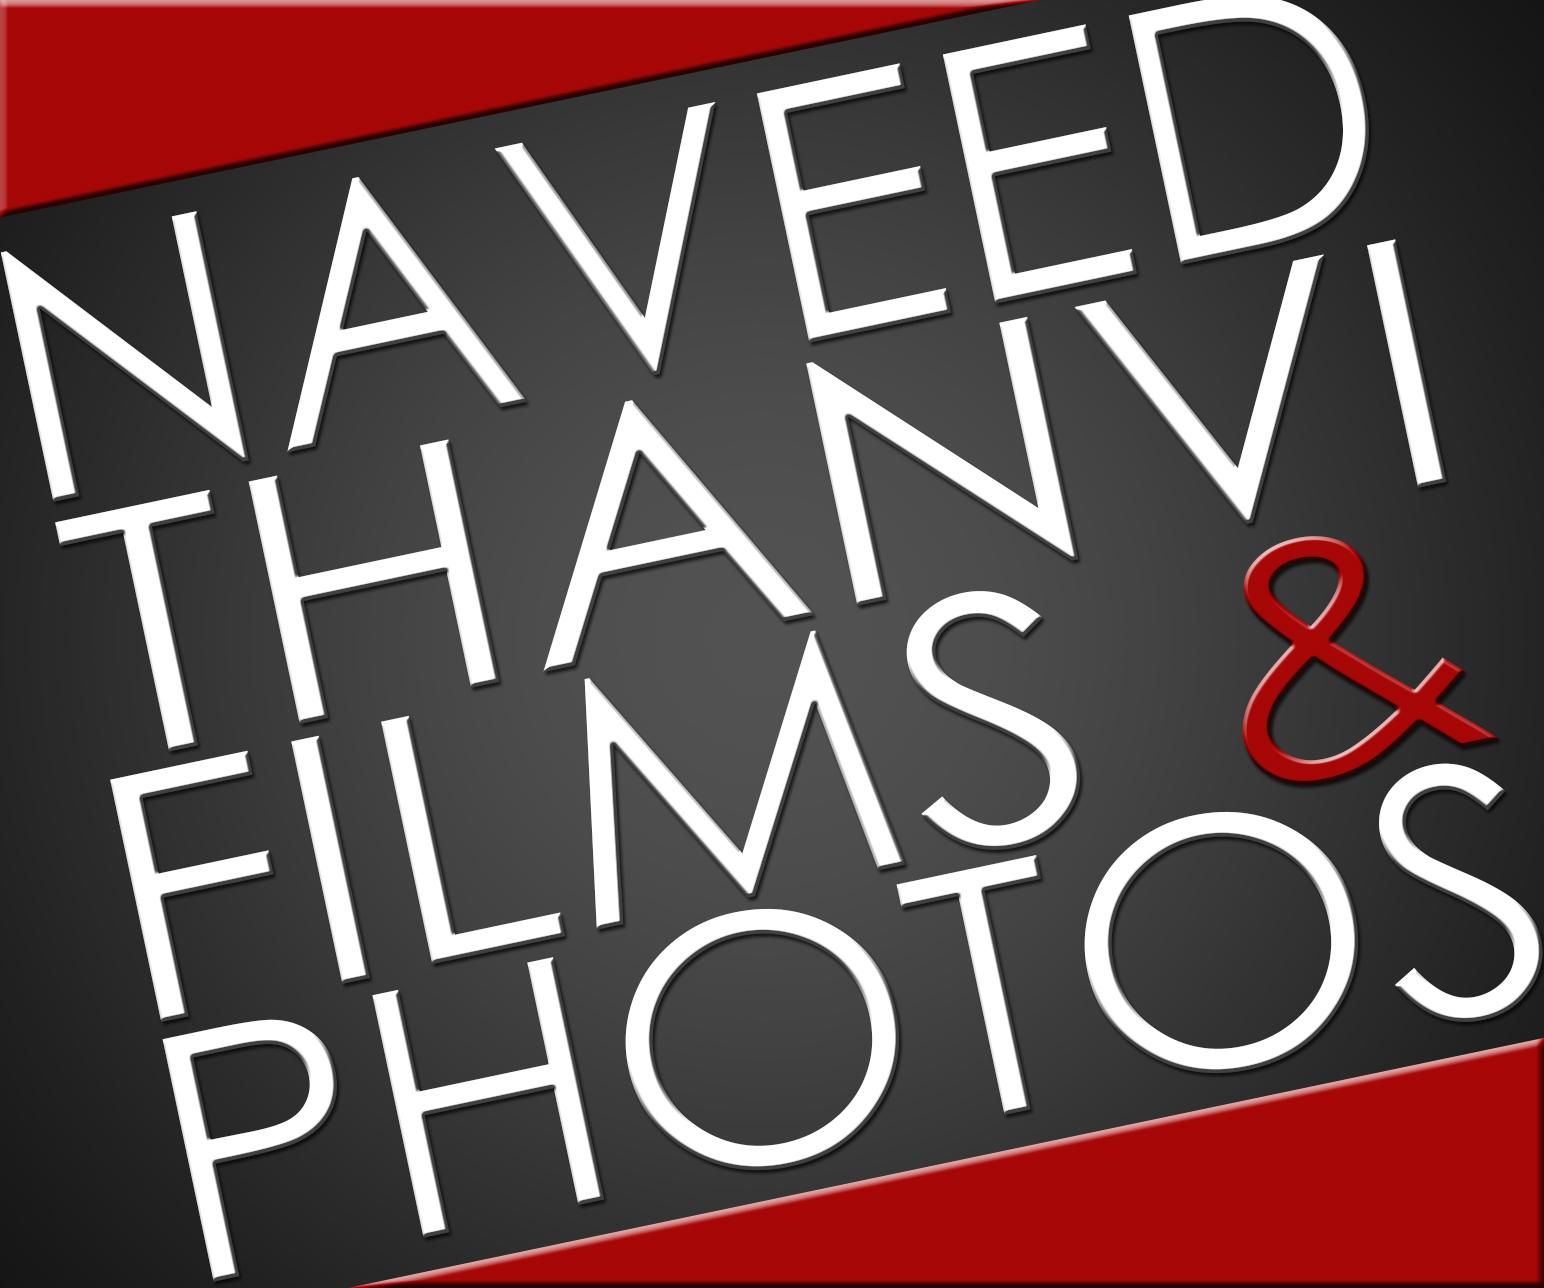 Naveed Thanvi Films & Photos